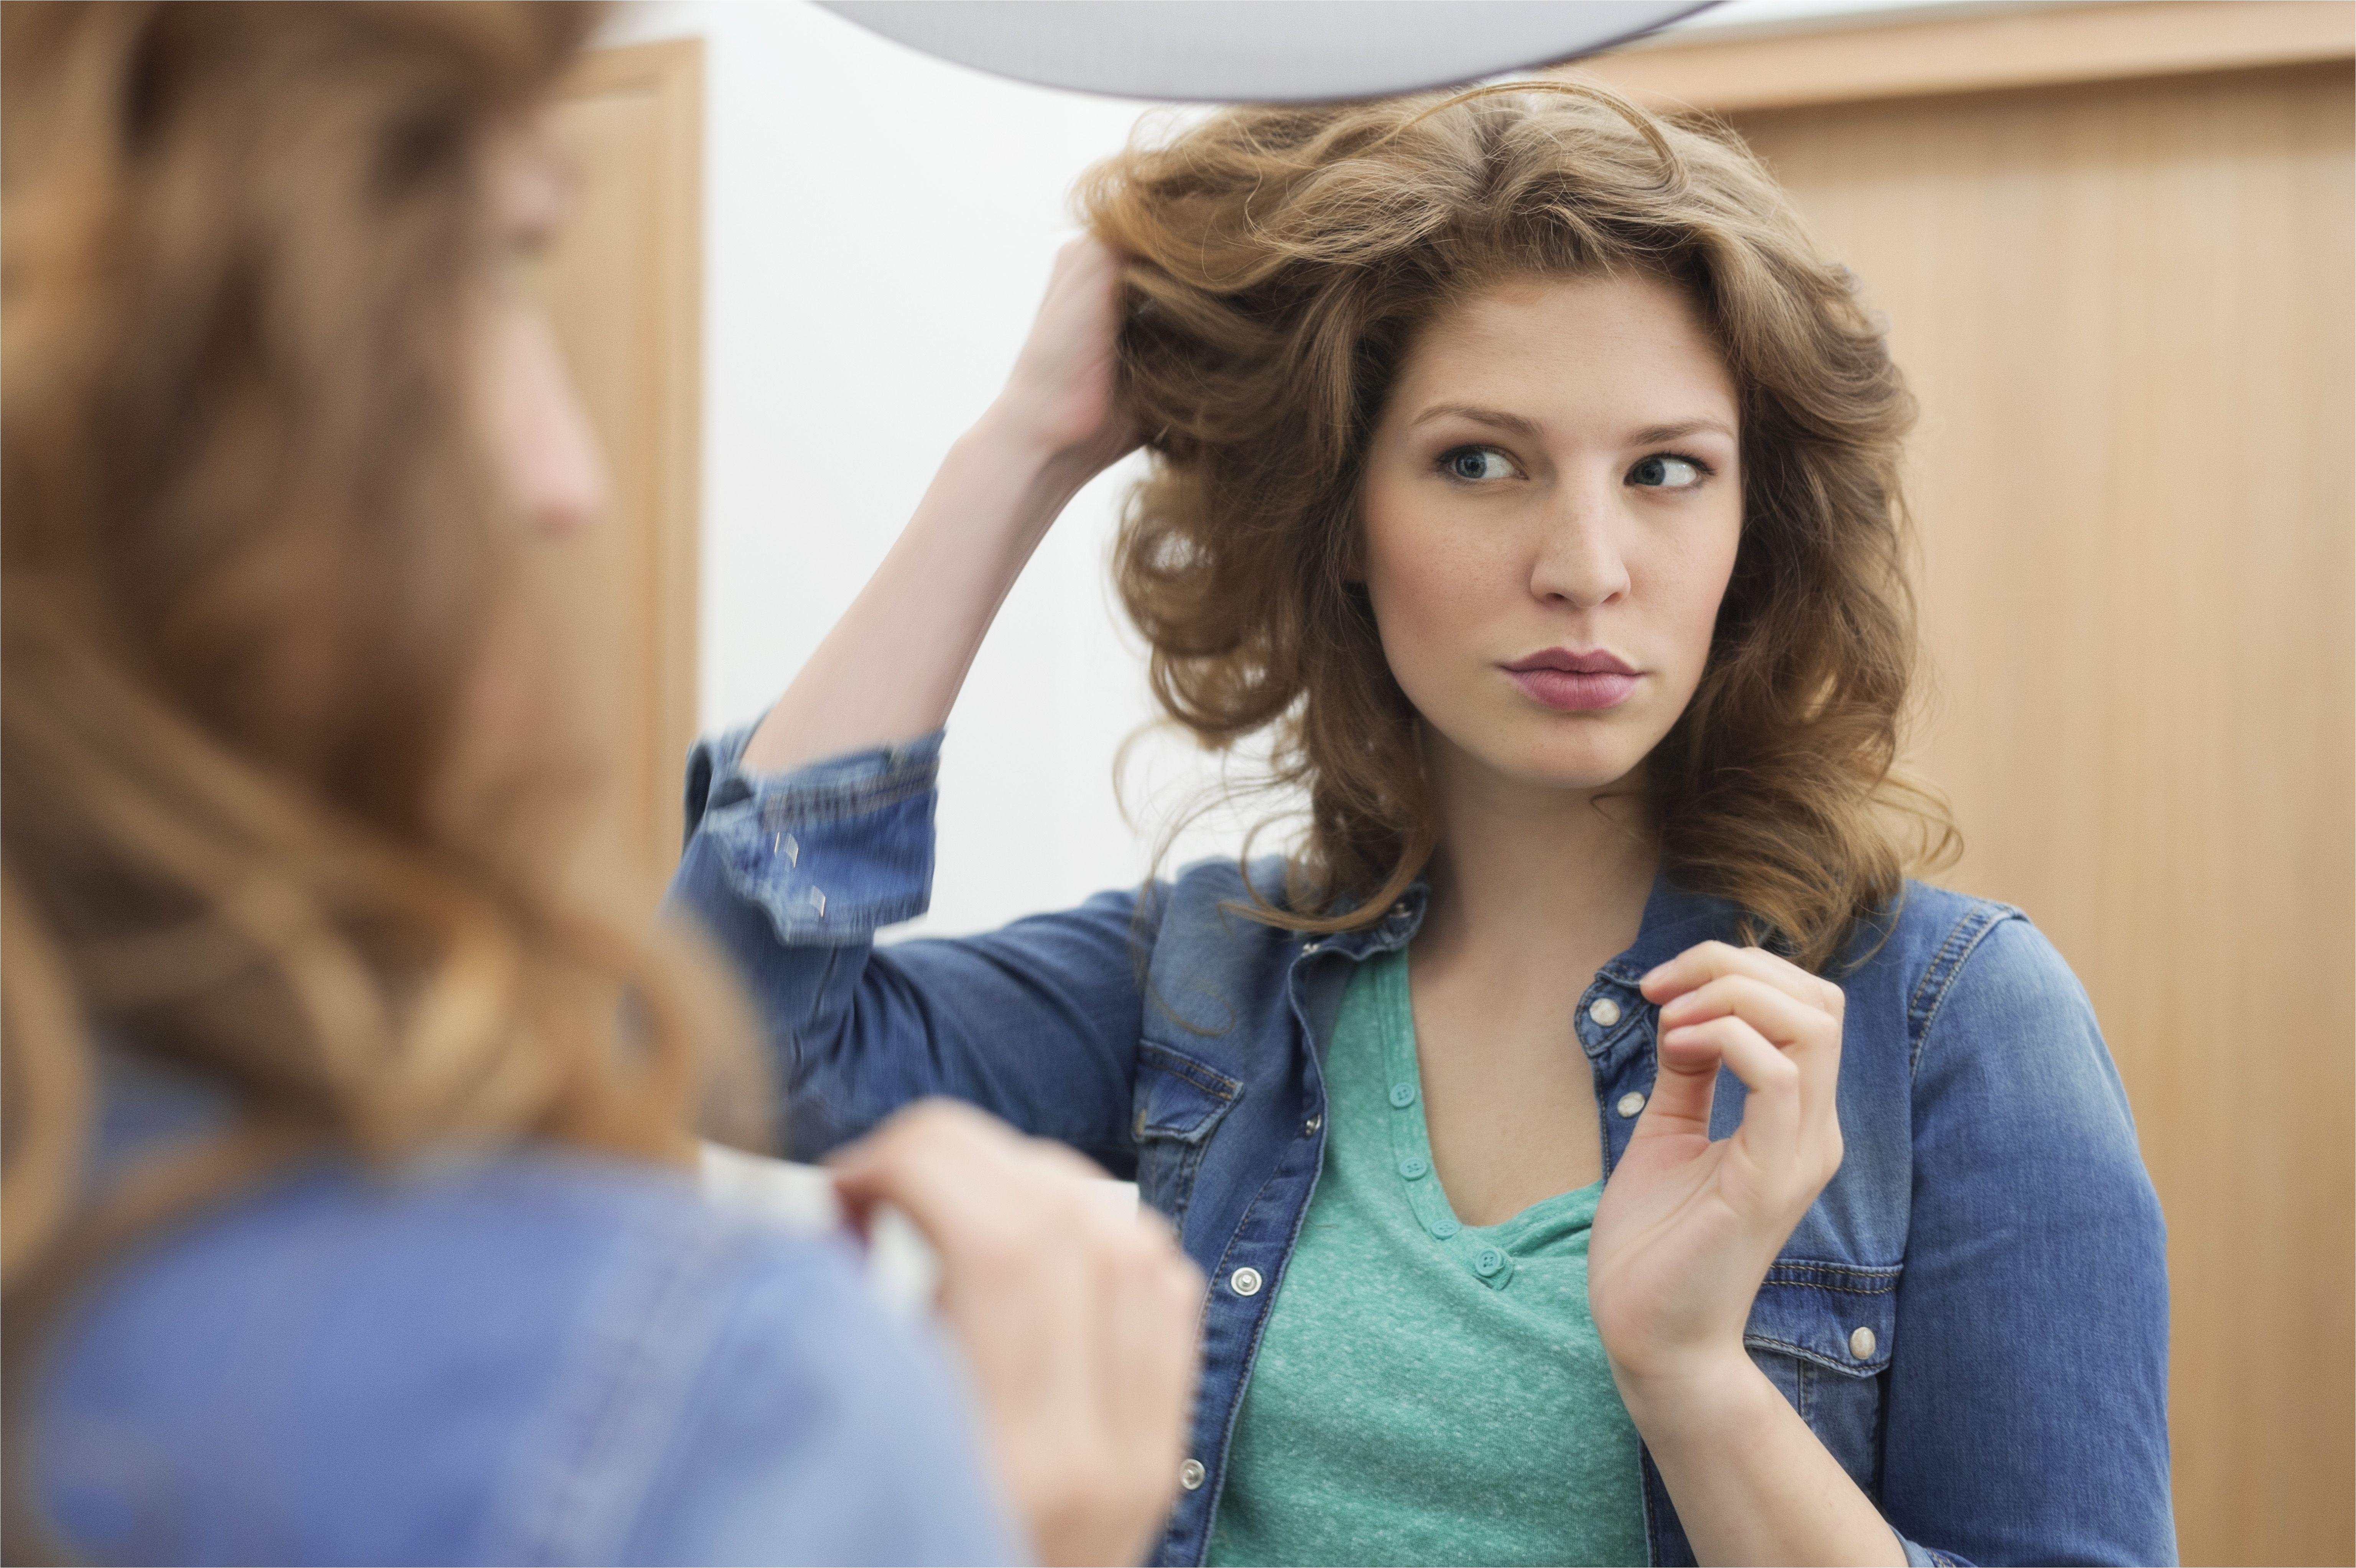 woman examining her hair 57ed3b4b5f9b586c35c8d835